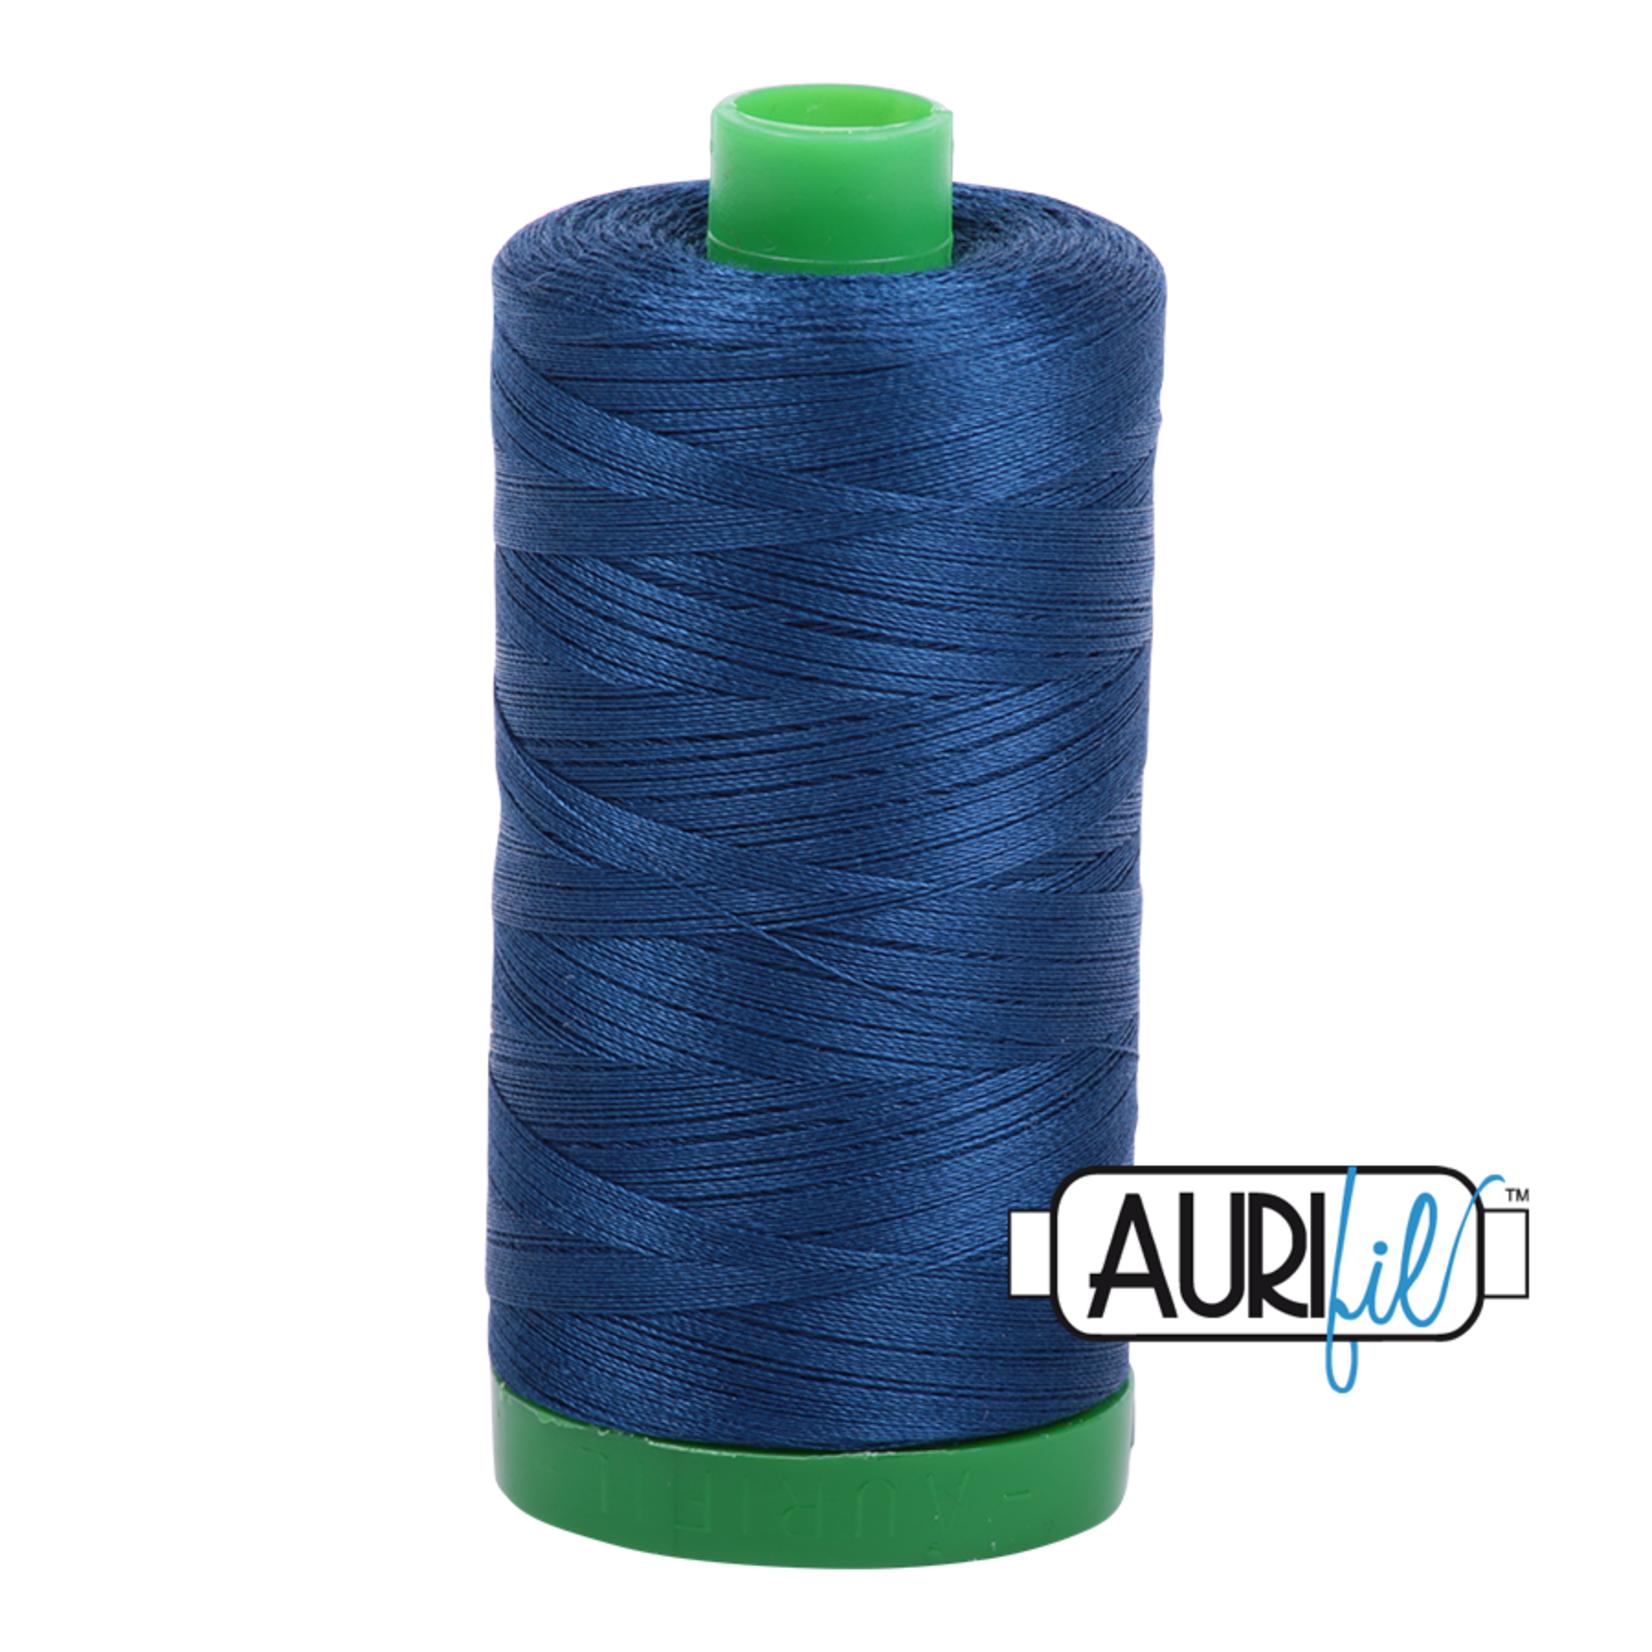 AURIFIL AURIFIL 40 WT Medium Delft Blue 2783